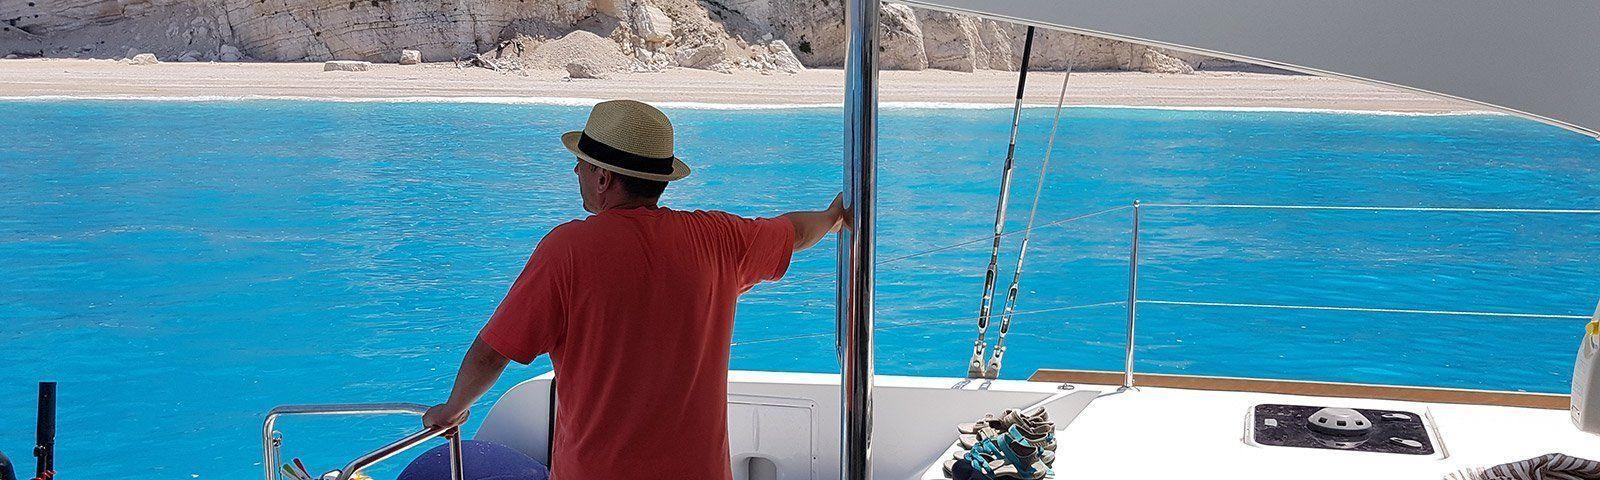 viaje-grecia-velero (1)